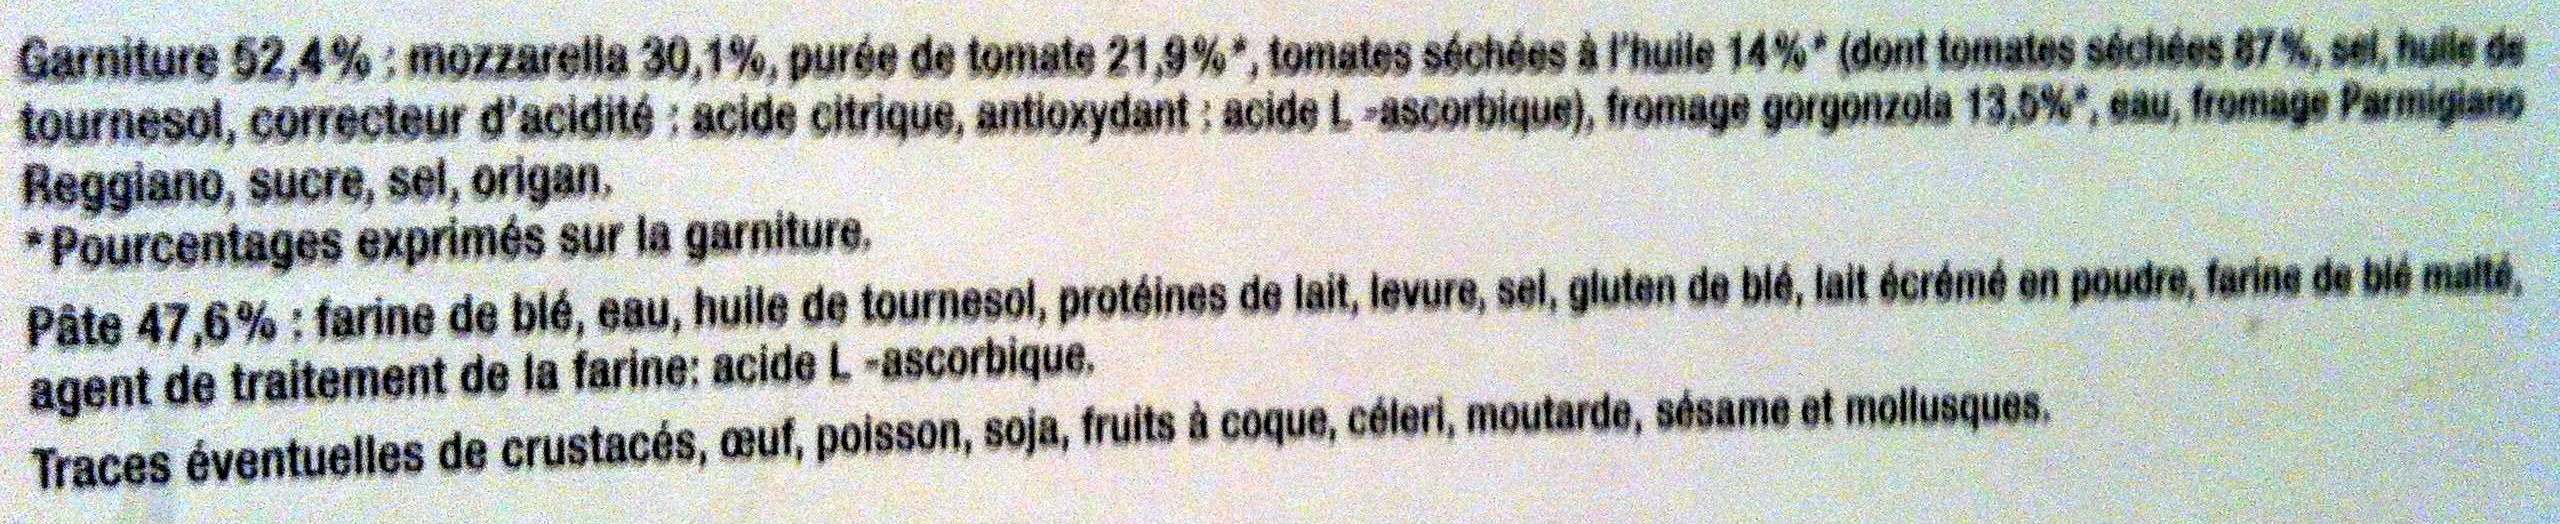 Pizza tomates séchées et gorgonzola - Ingrédients